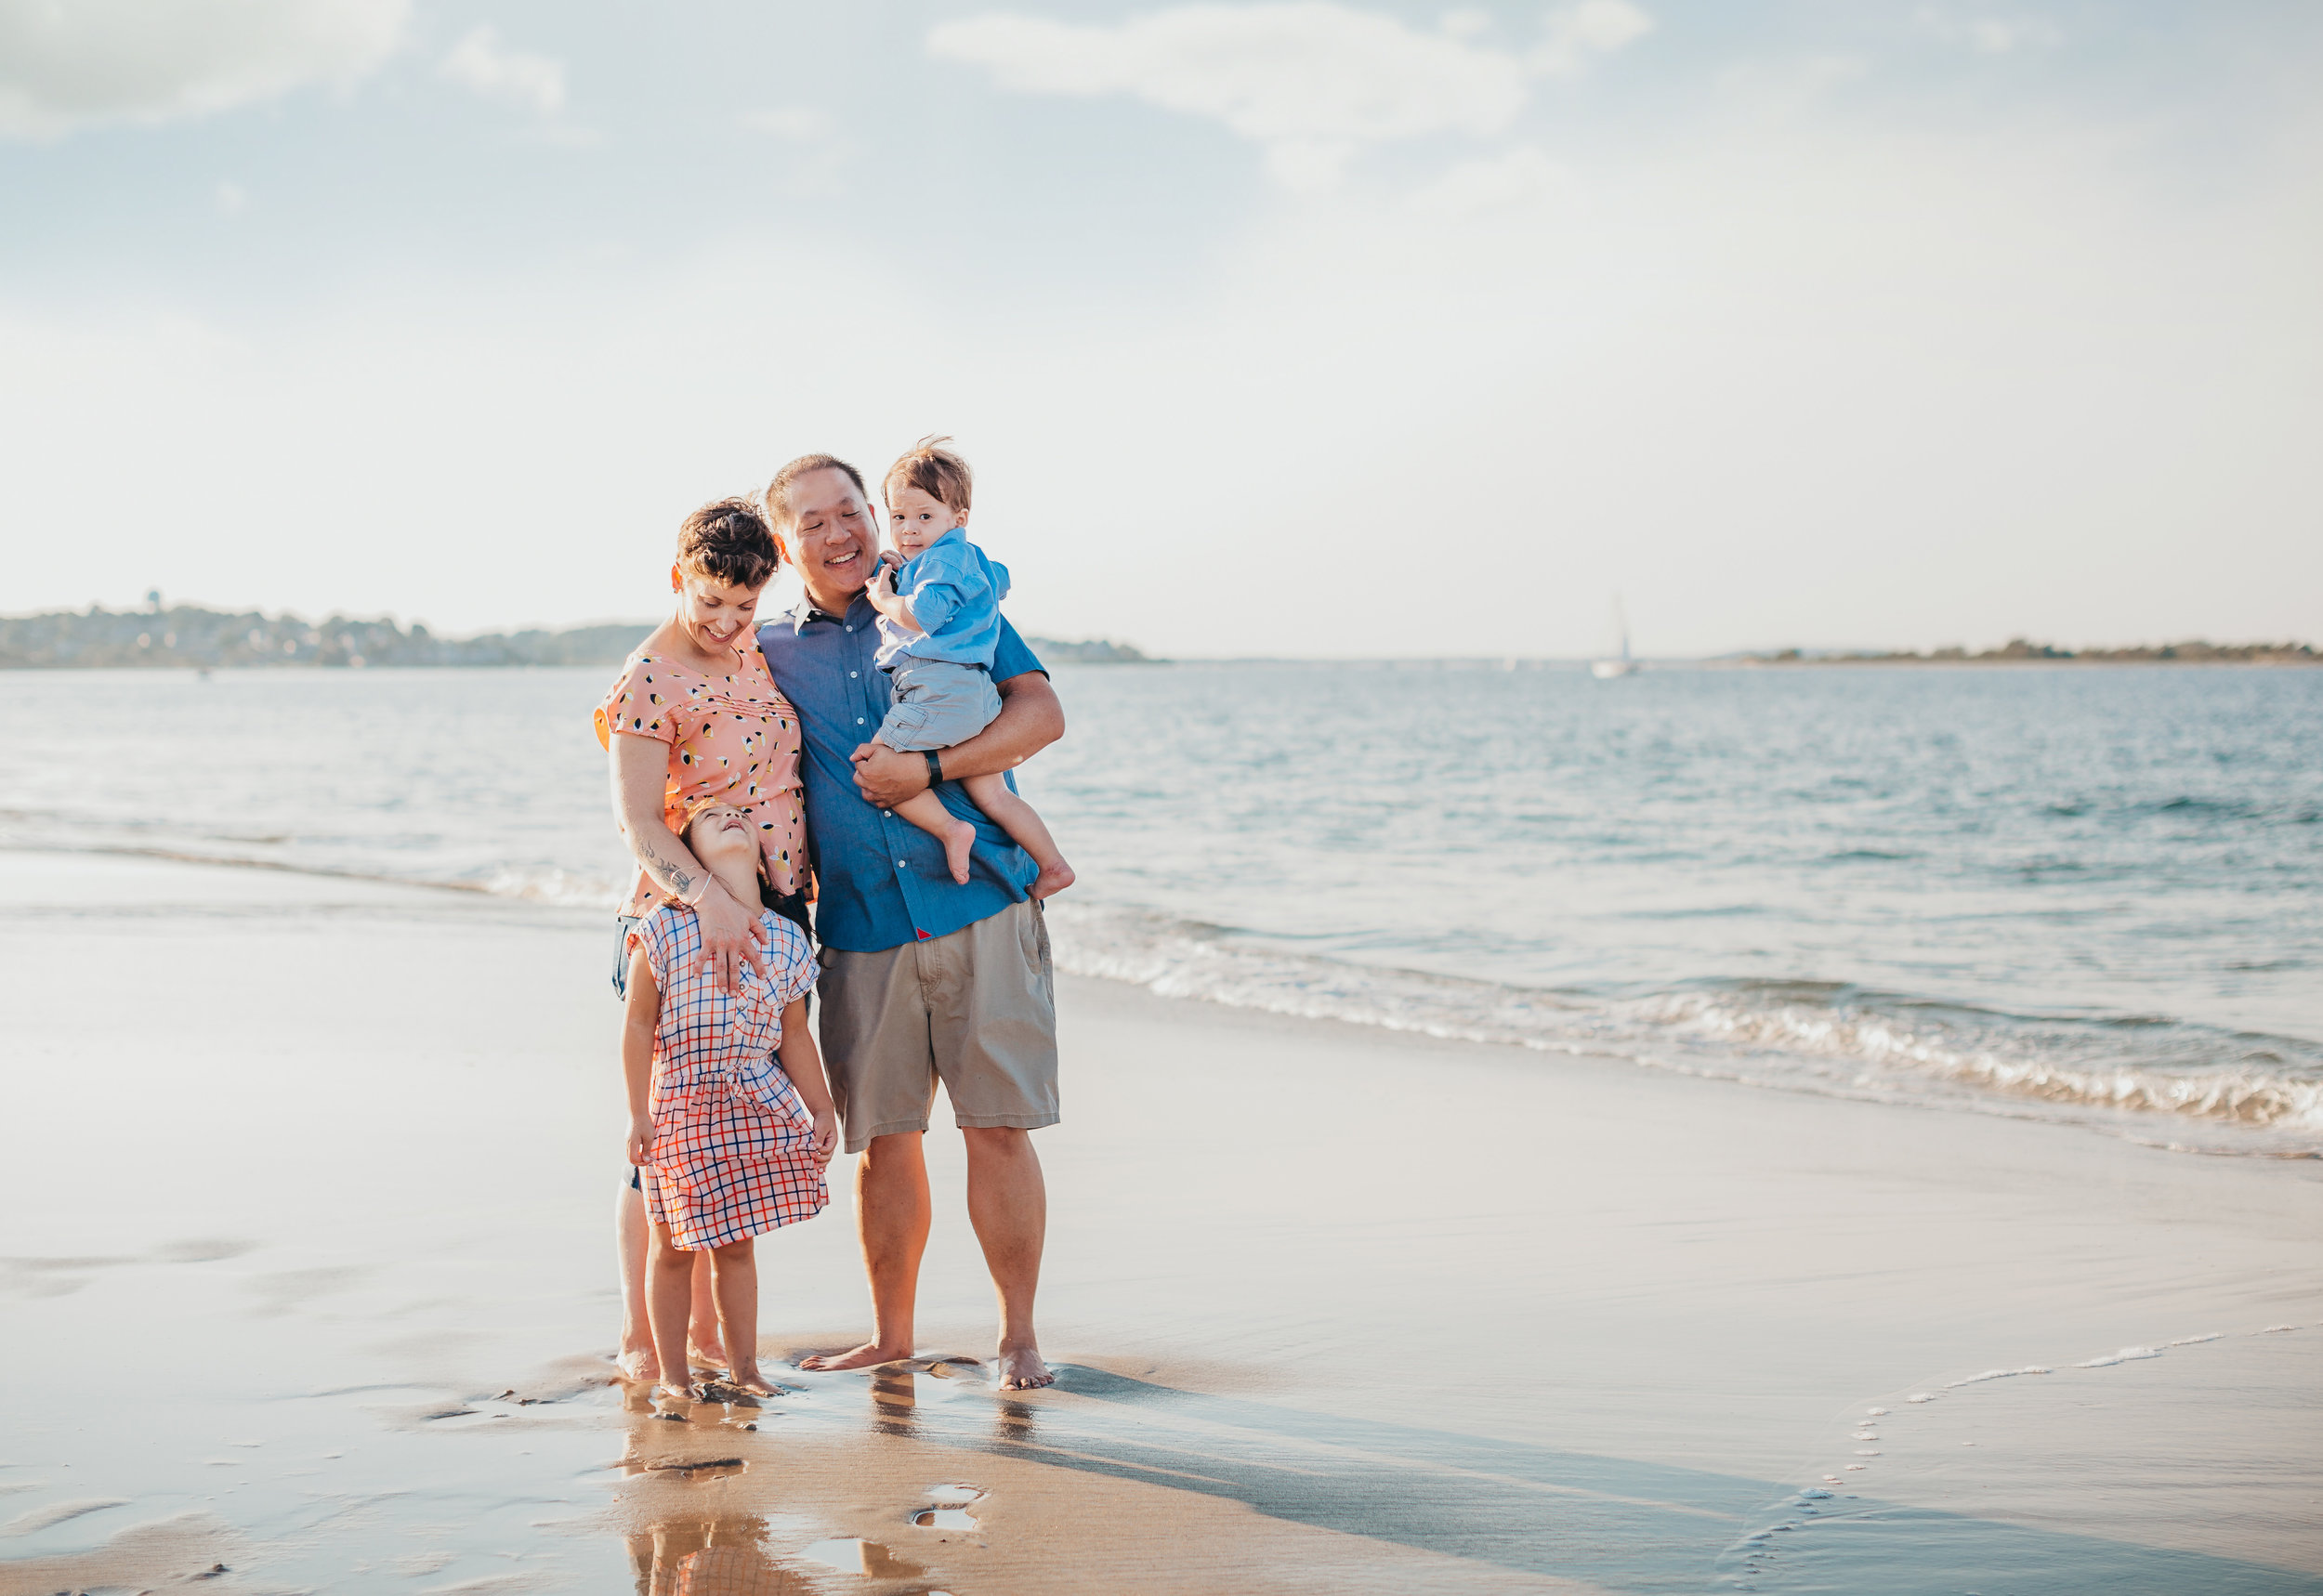 family-beach-photos-new-england-joy-leduc-boston-family-photographer.jpg